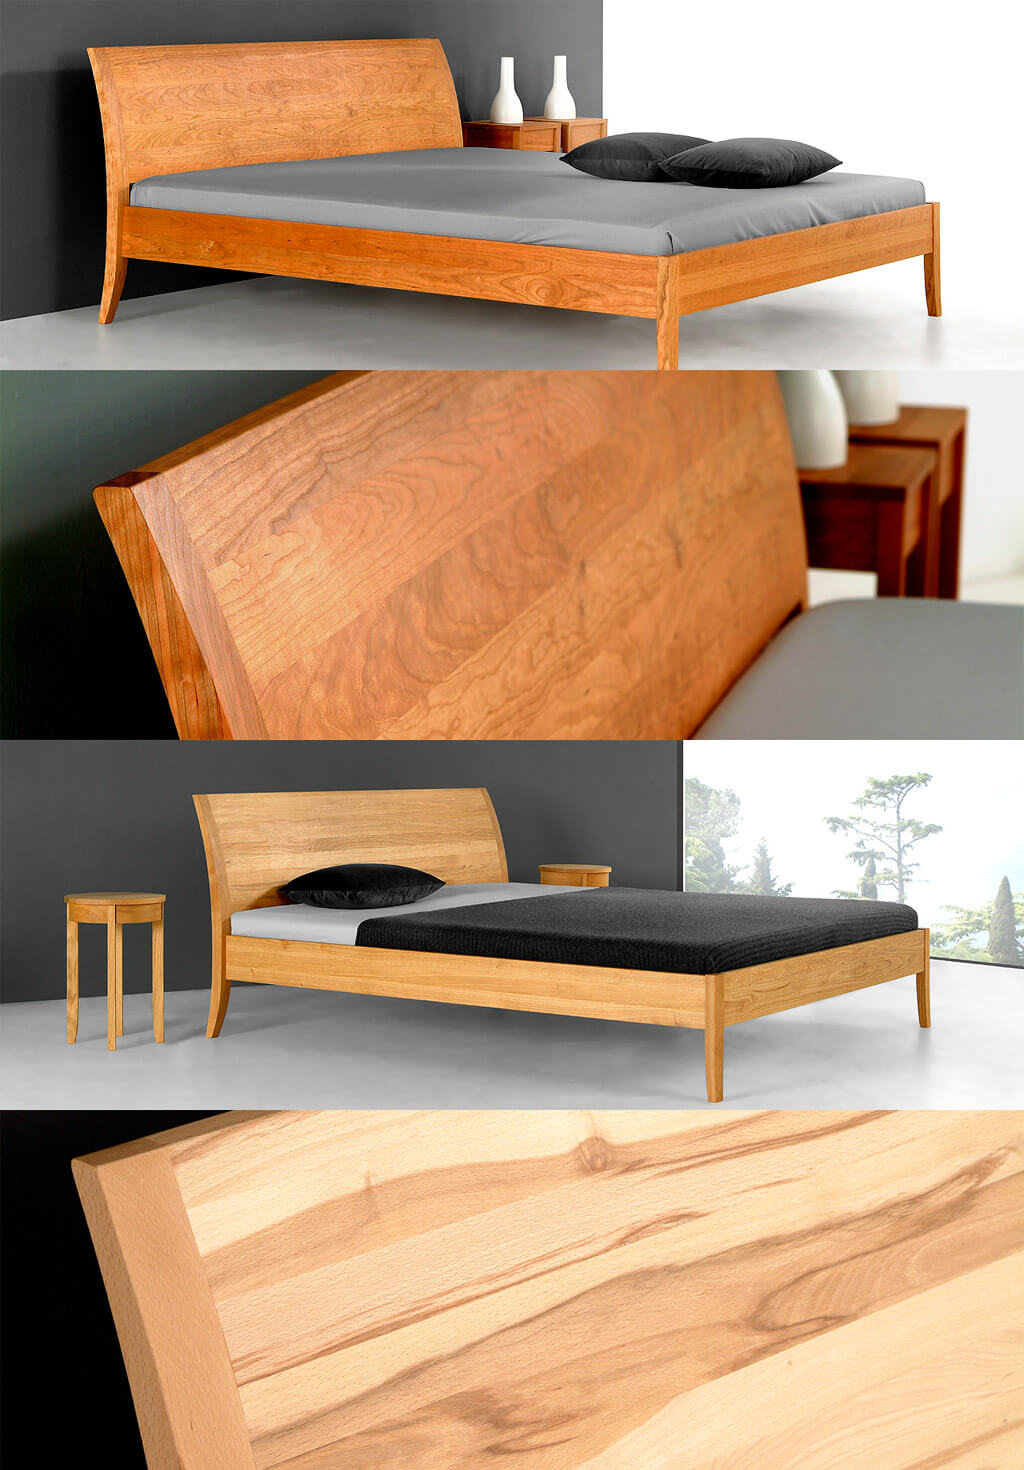 Coburger-Werksta-tten-Massivholzbett-Classico-Abbildung-Holzarten-Beispiele